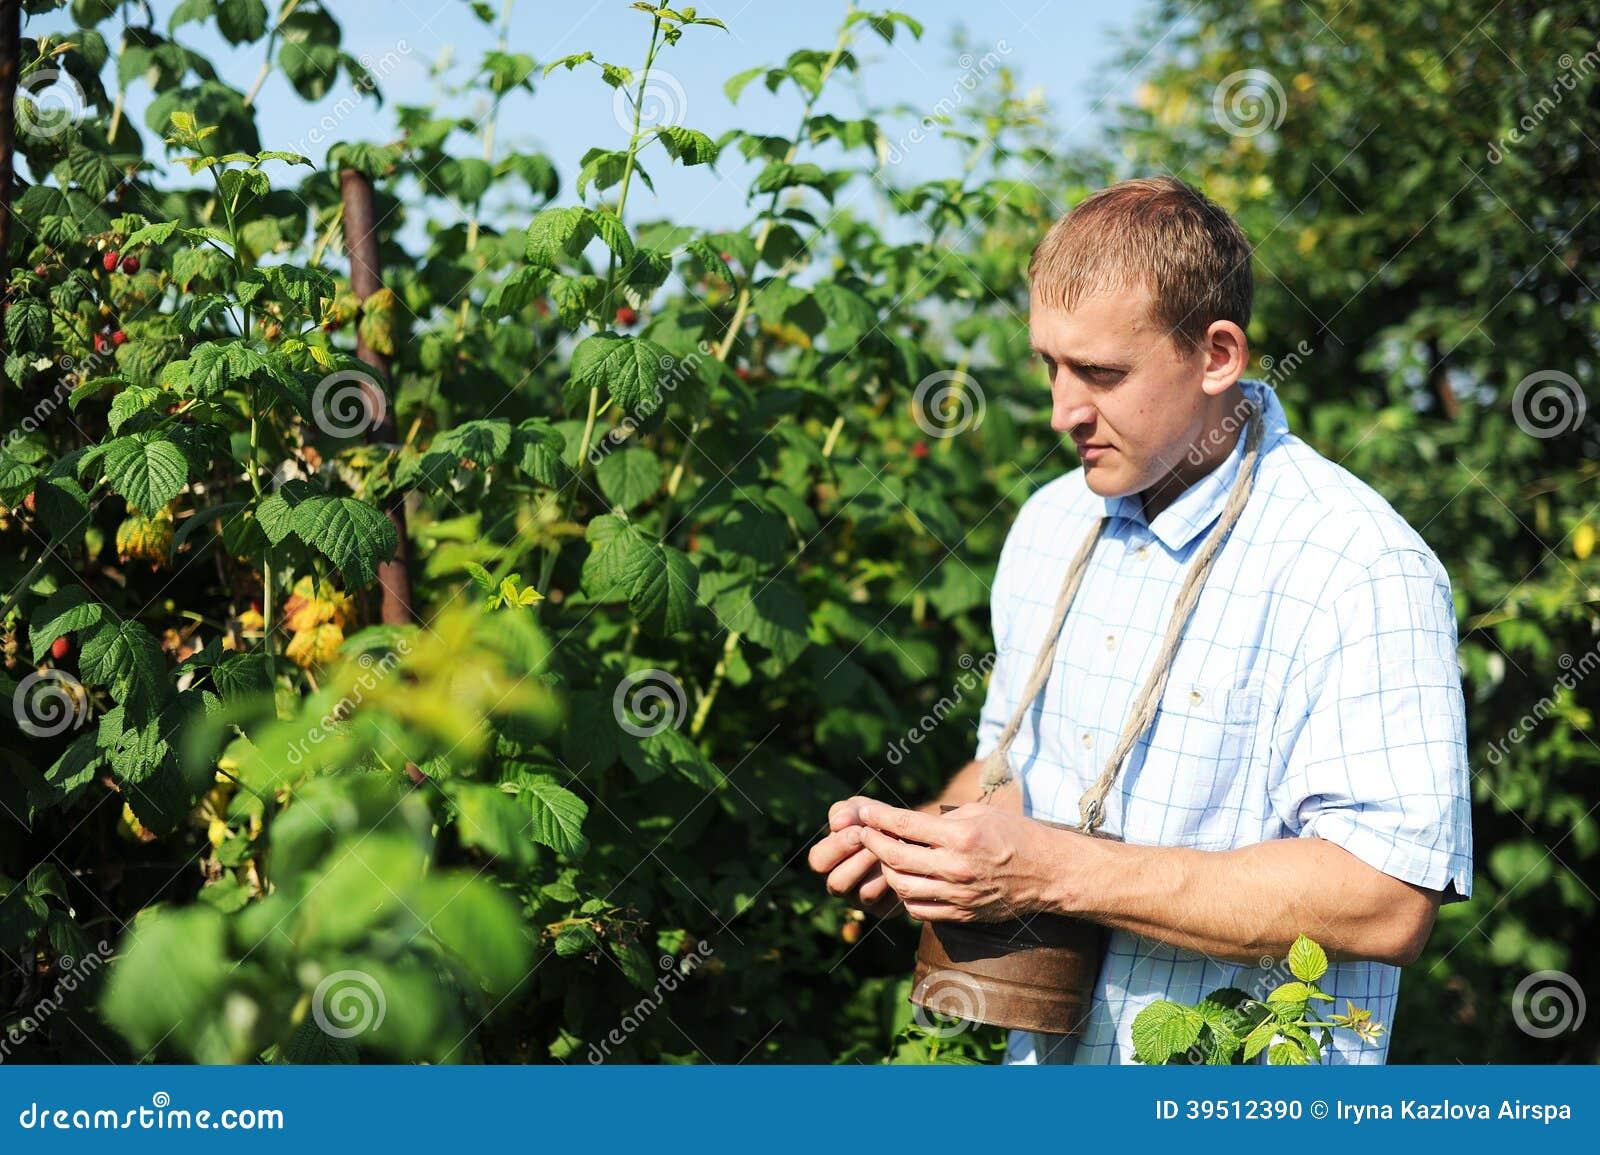 The man gathers raspberry